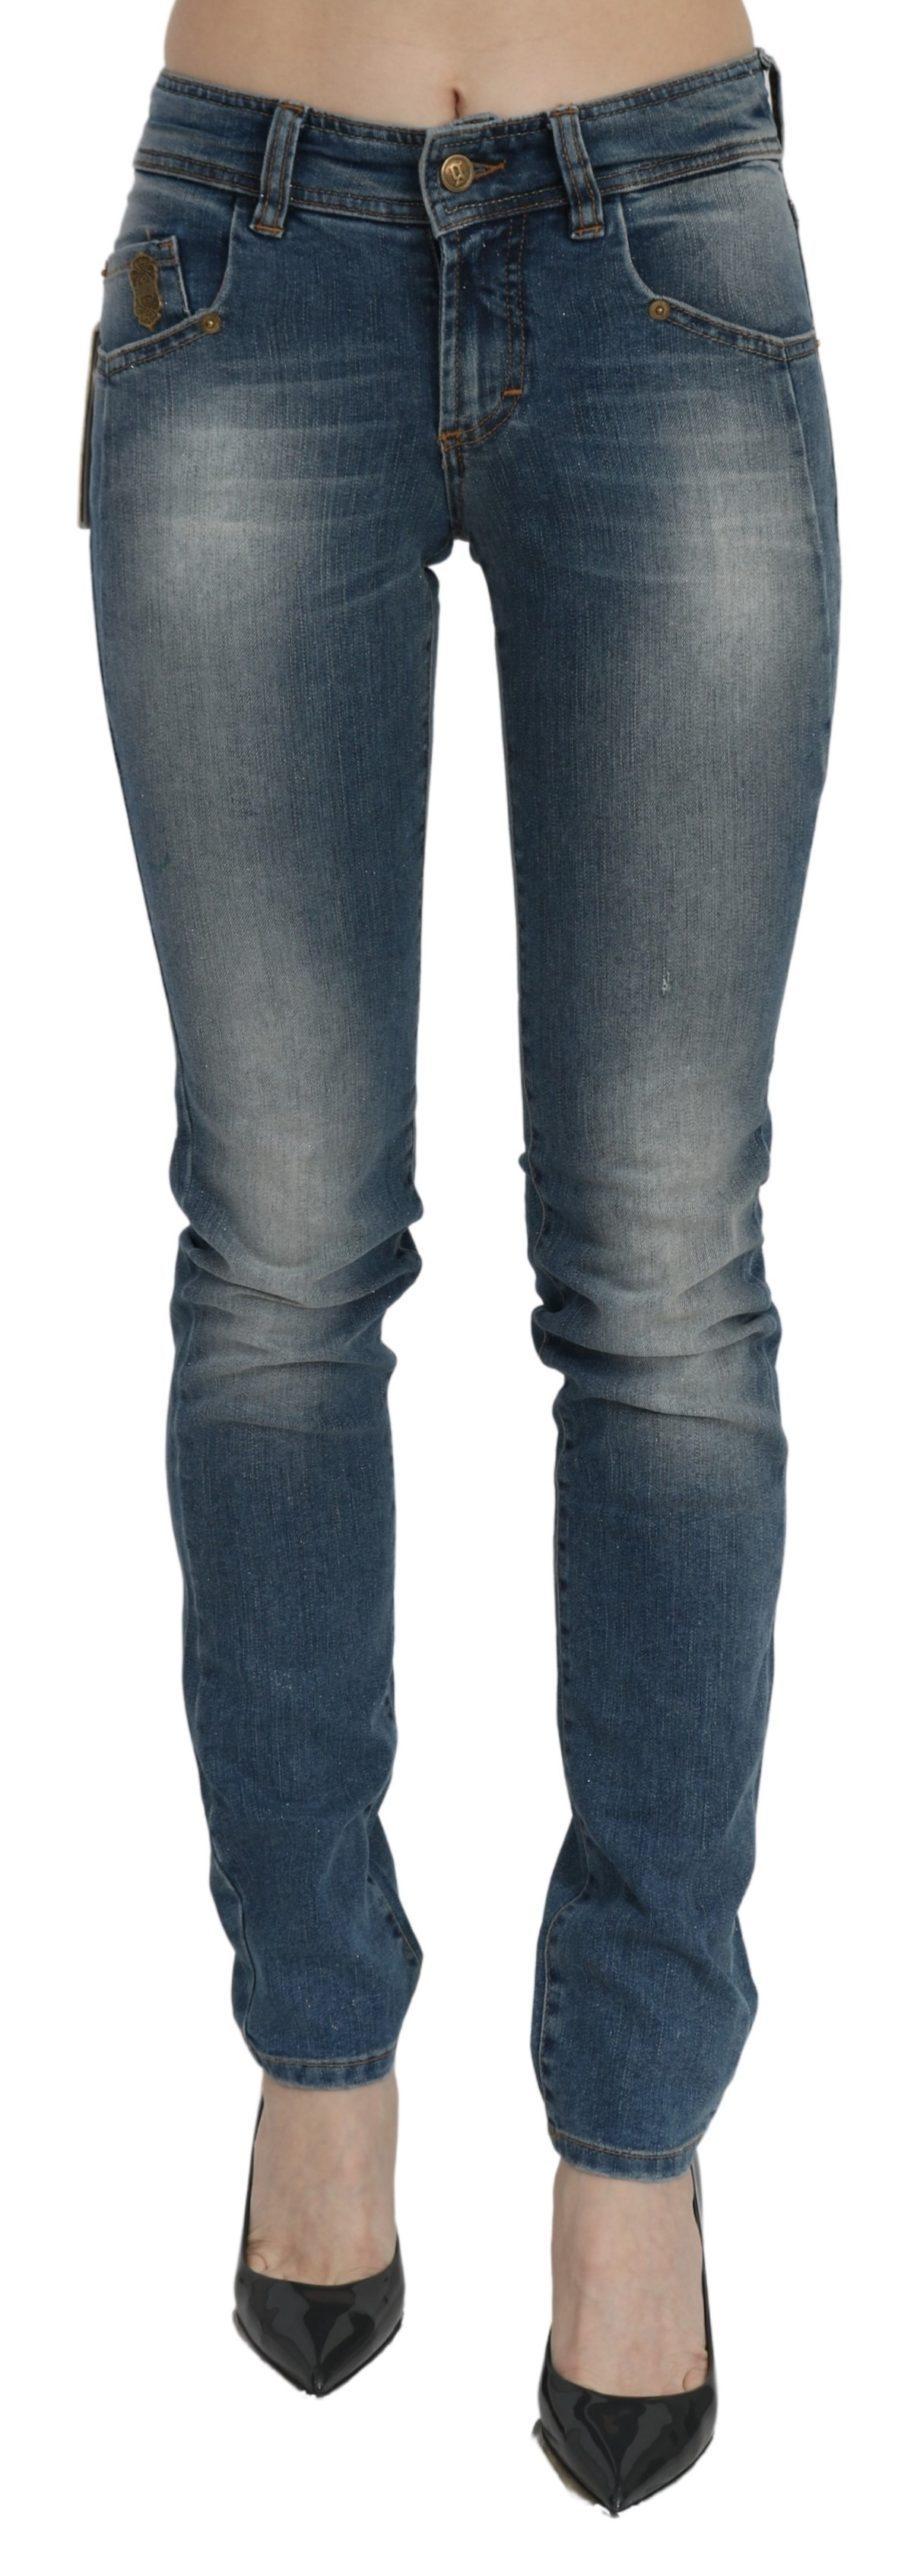 John Galliano Women's Washed Mid Waist Slim Fit Denim Jeans Blue PAN70448 - W26